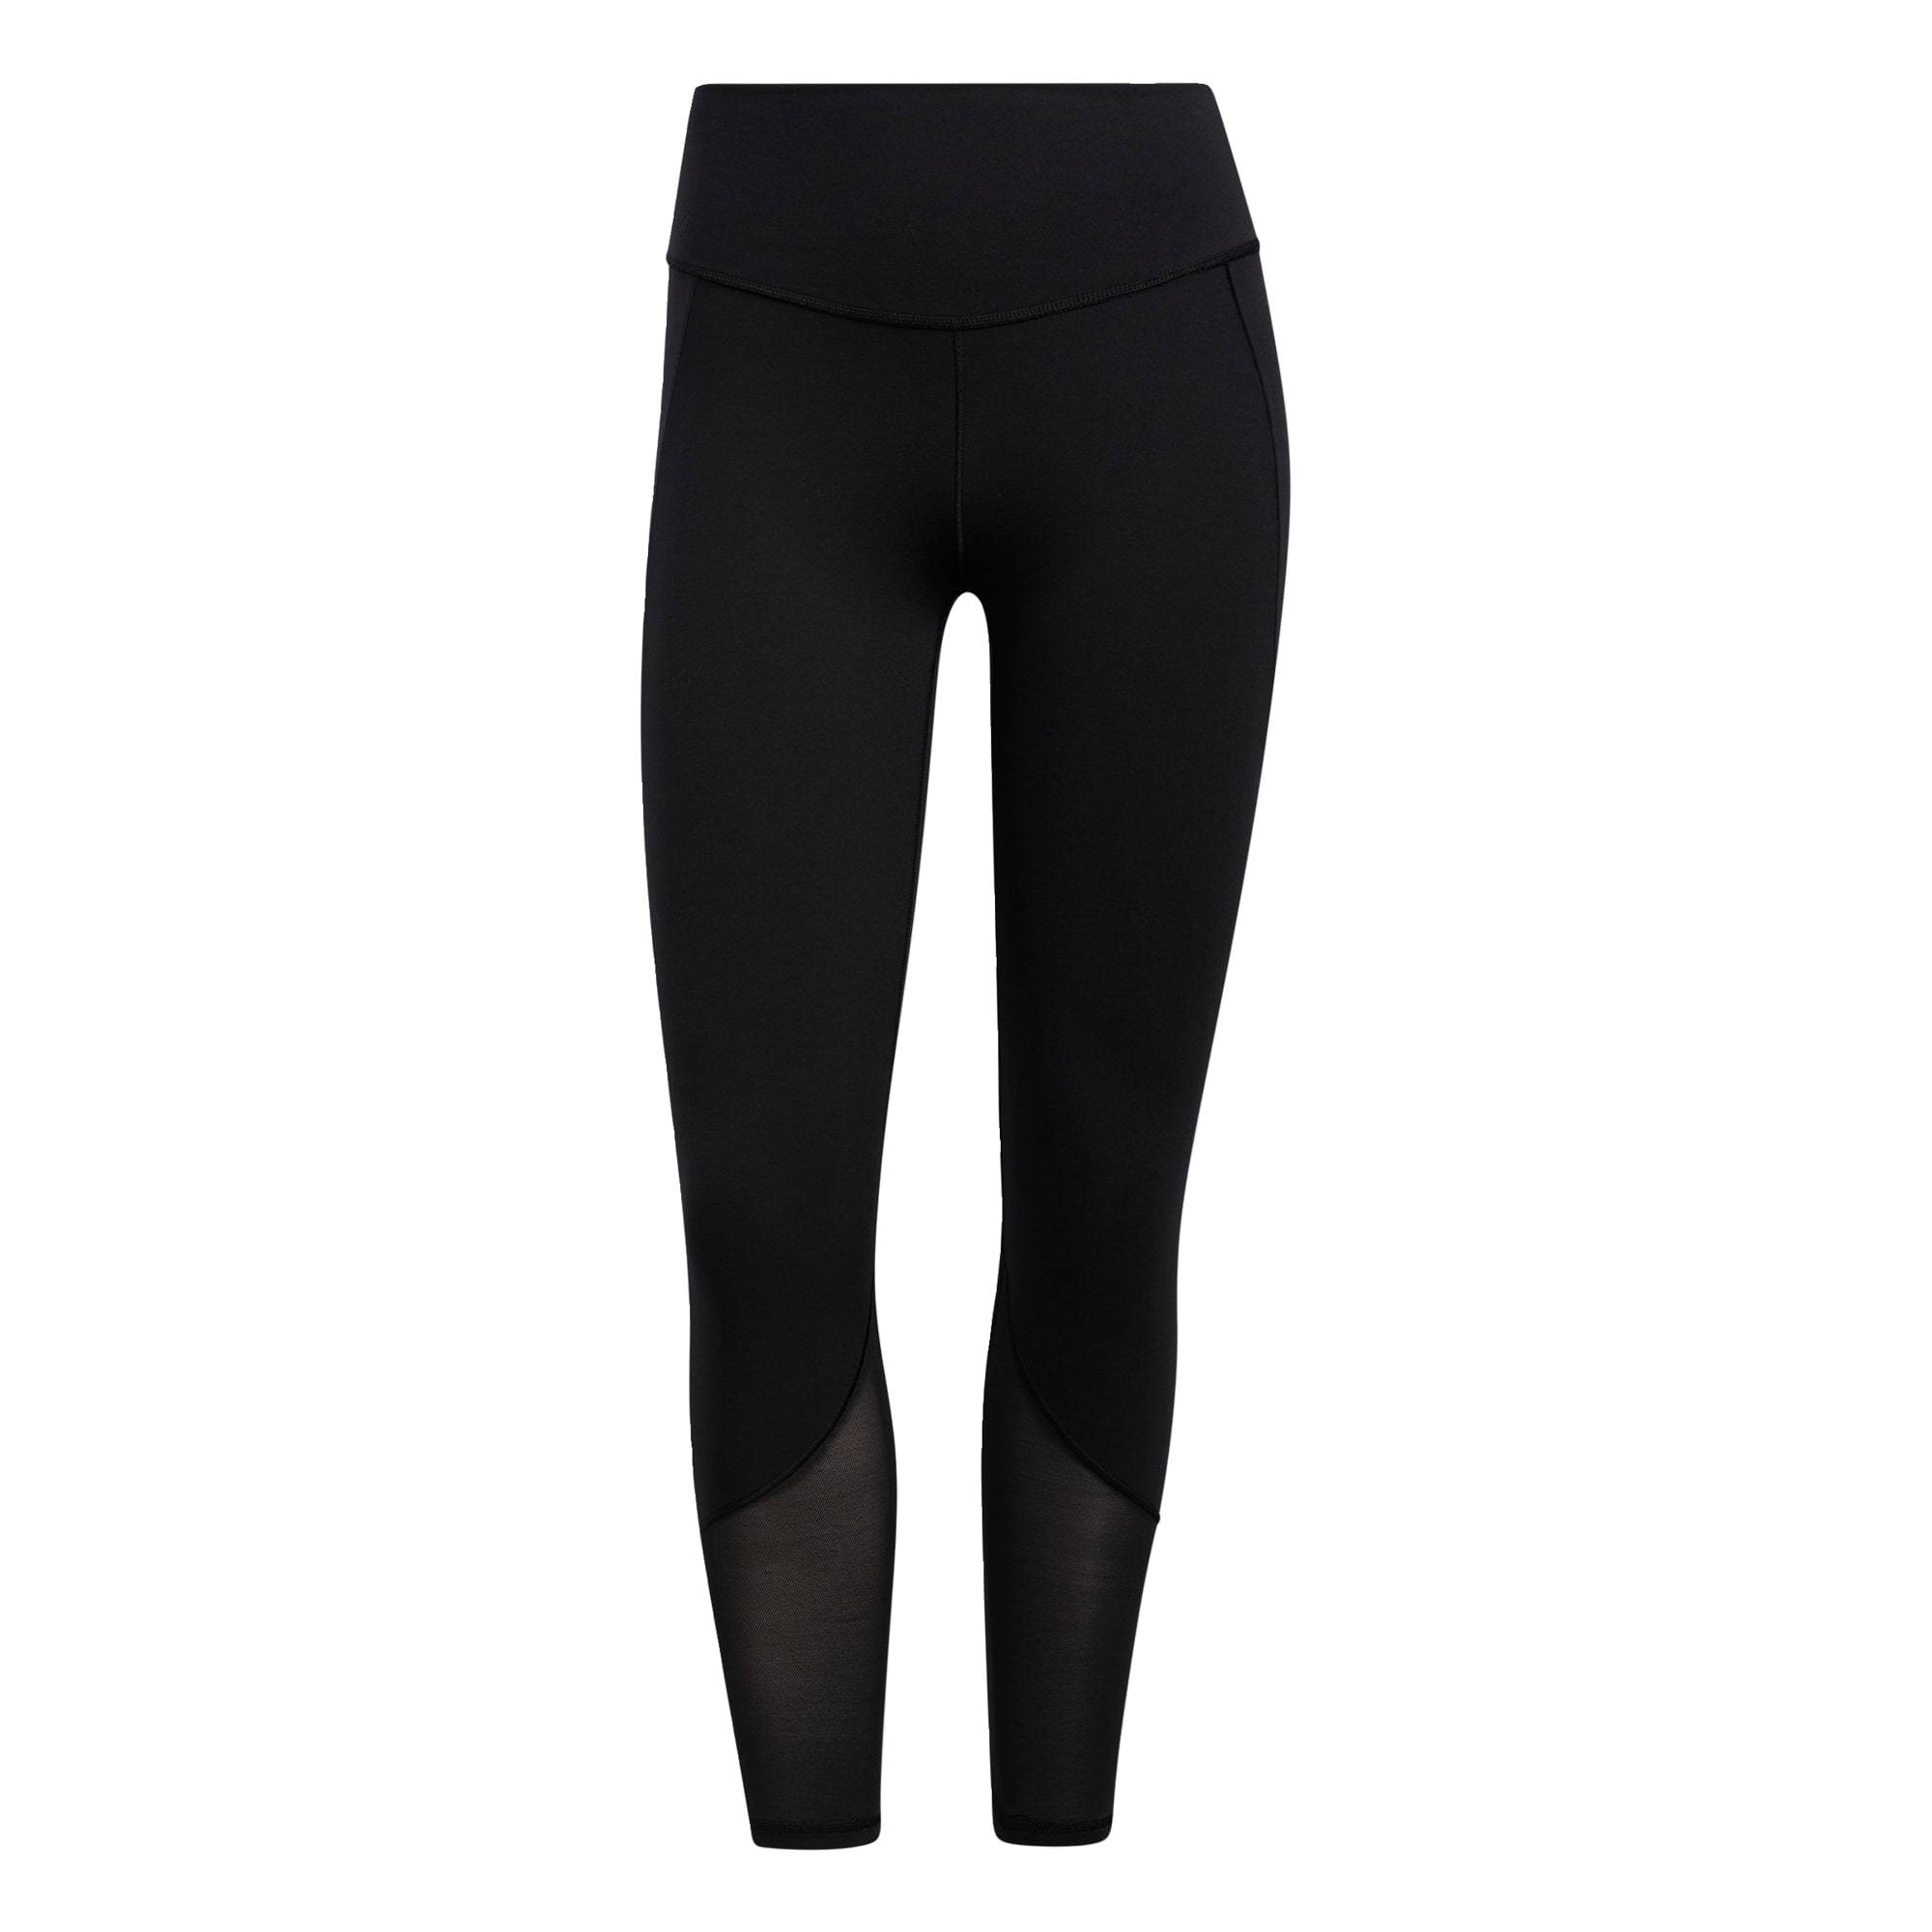 adidas performance pantaloni sportivi 'yoga power' nero